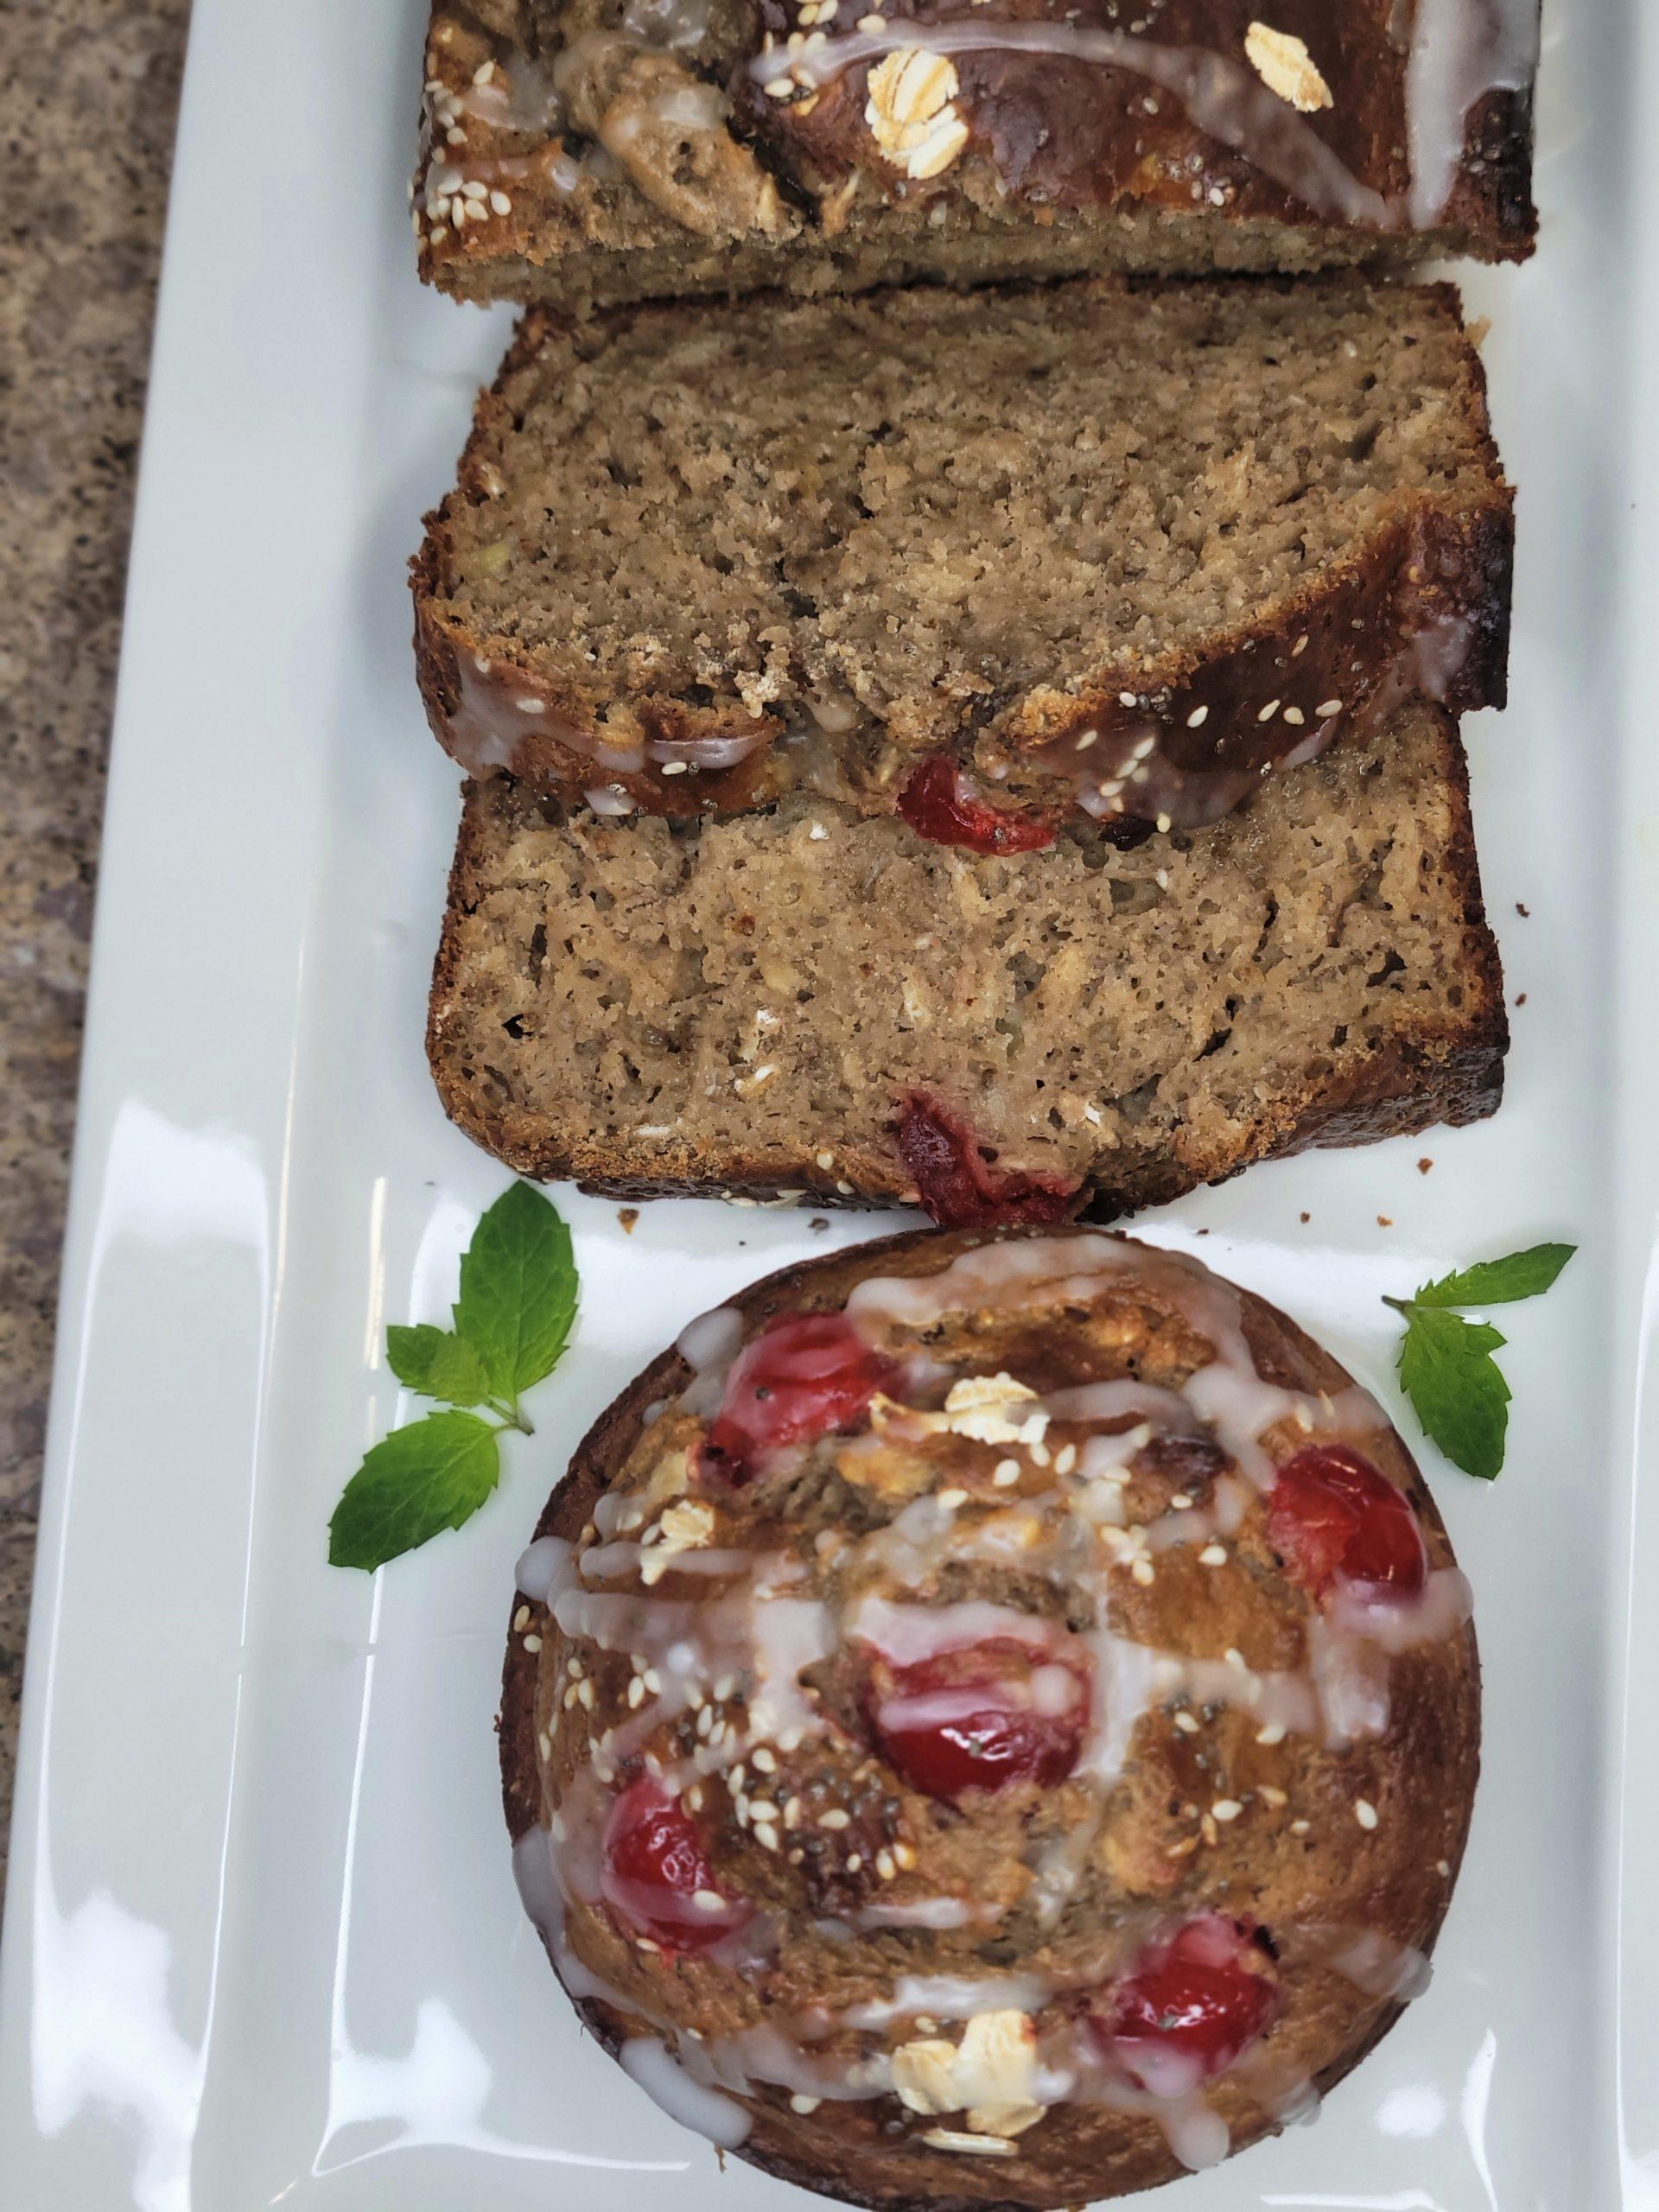 Banana bread with chia seeds